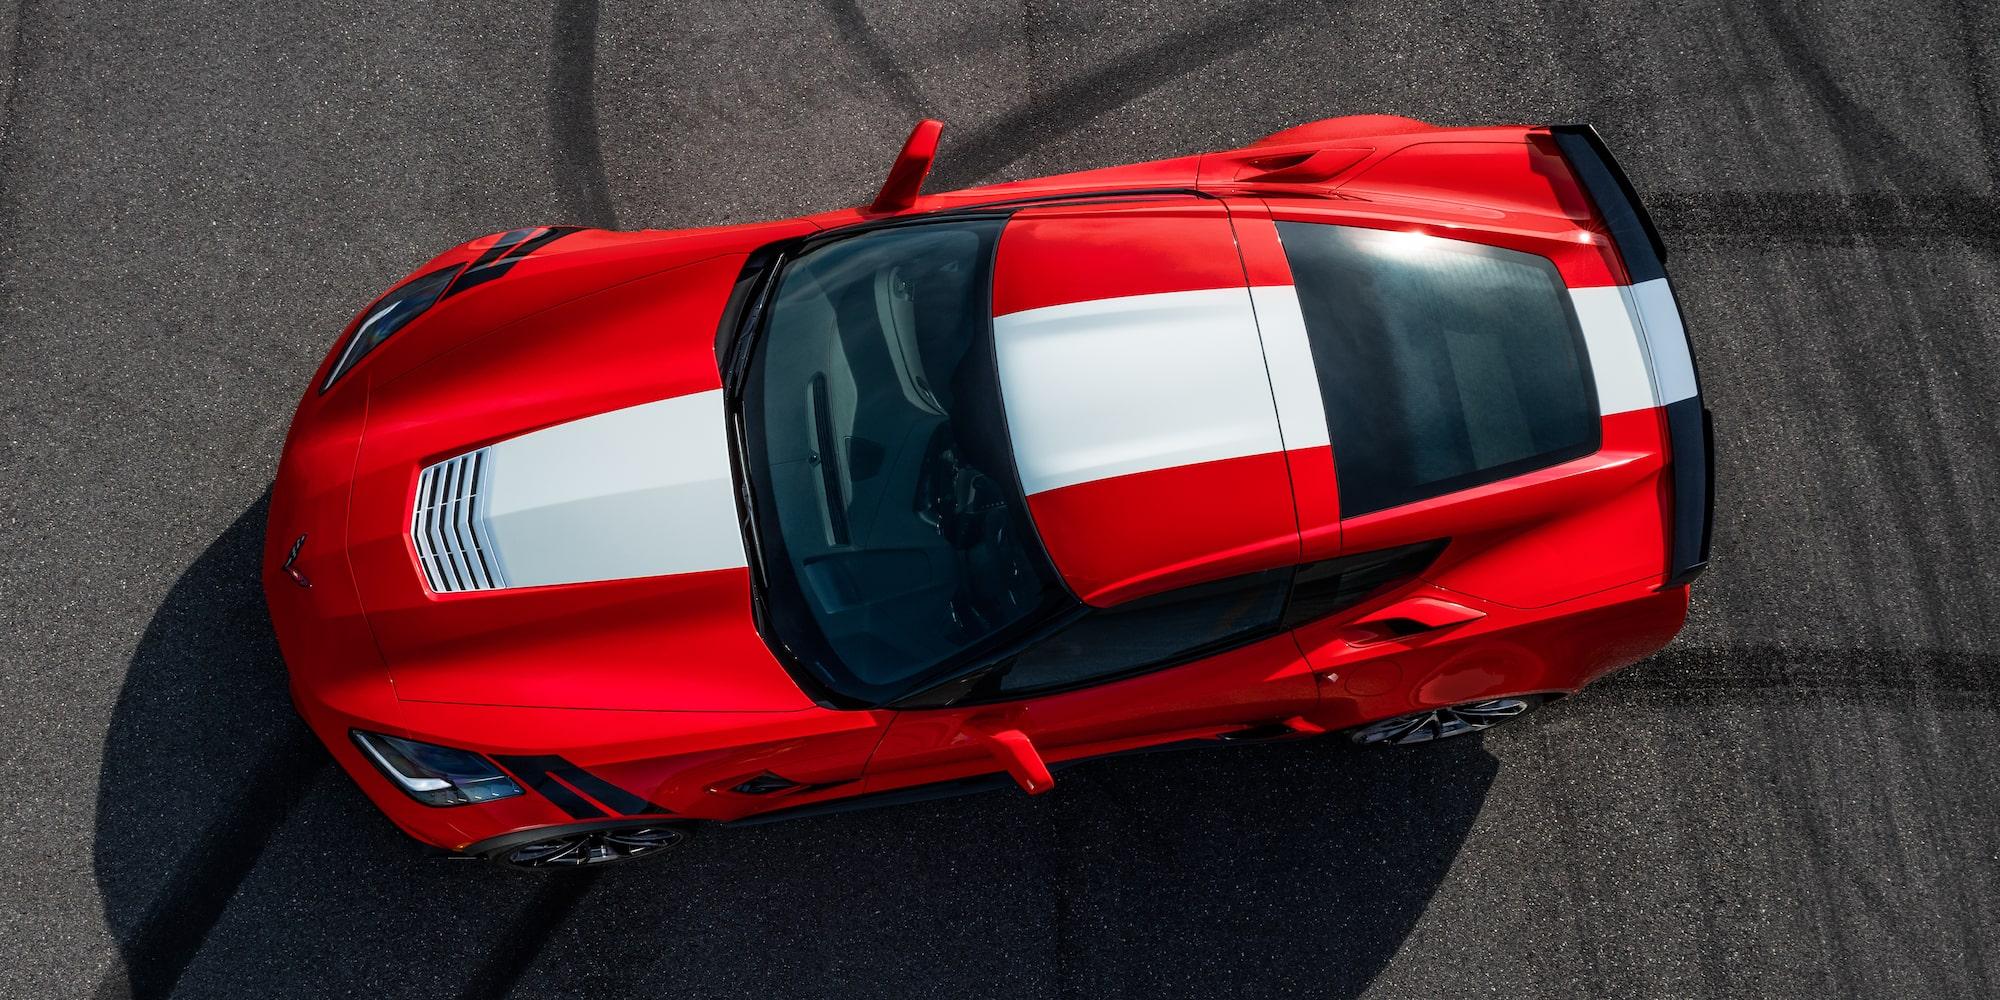 02 Corvette Navigation System